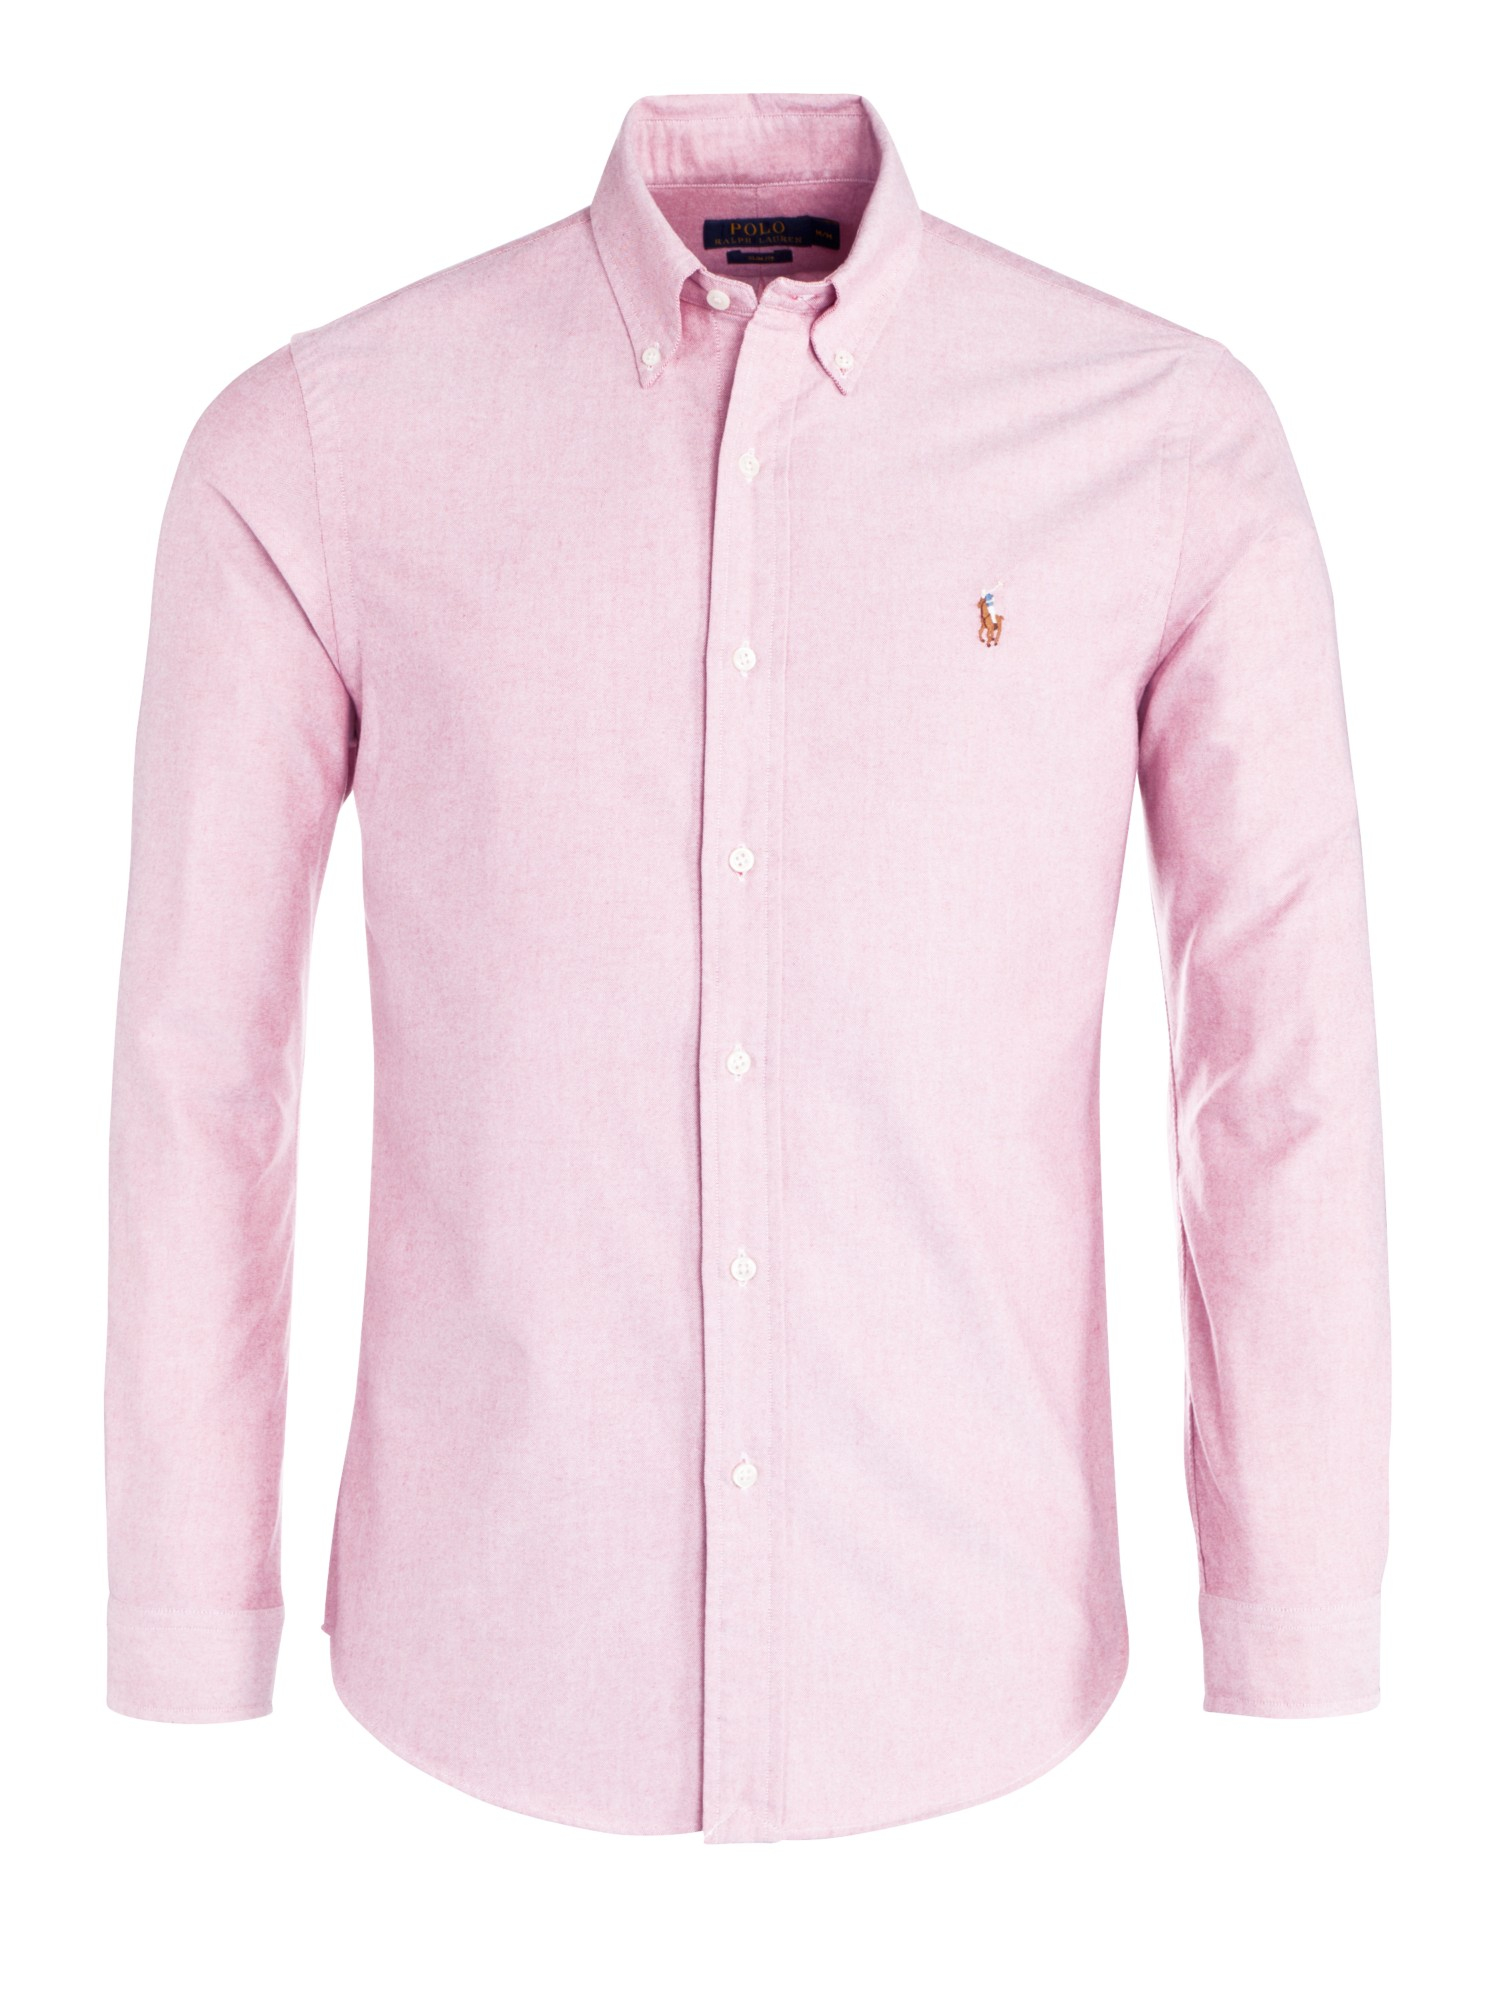 Ralph Lauren Casual Oxford Shirt Custom Fit in Pink